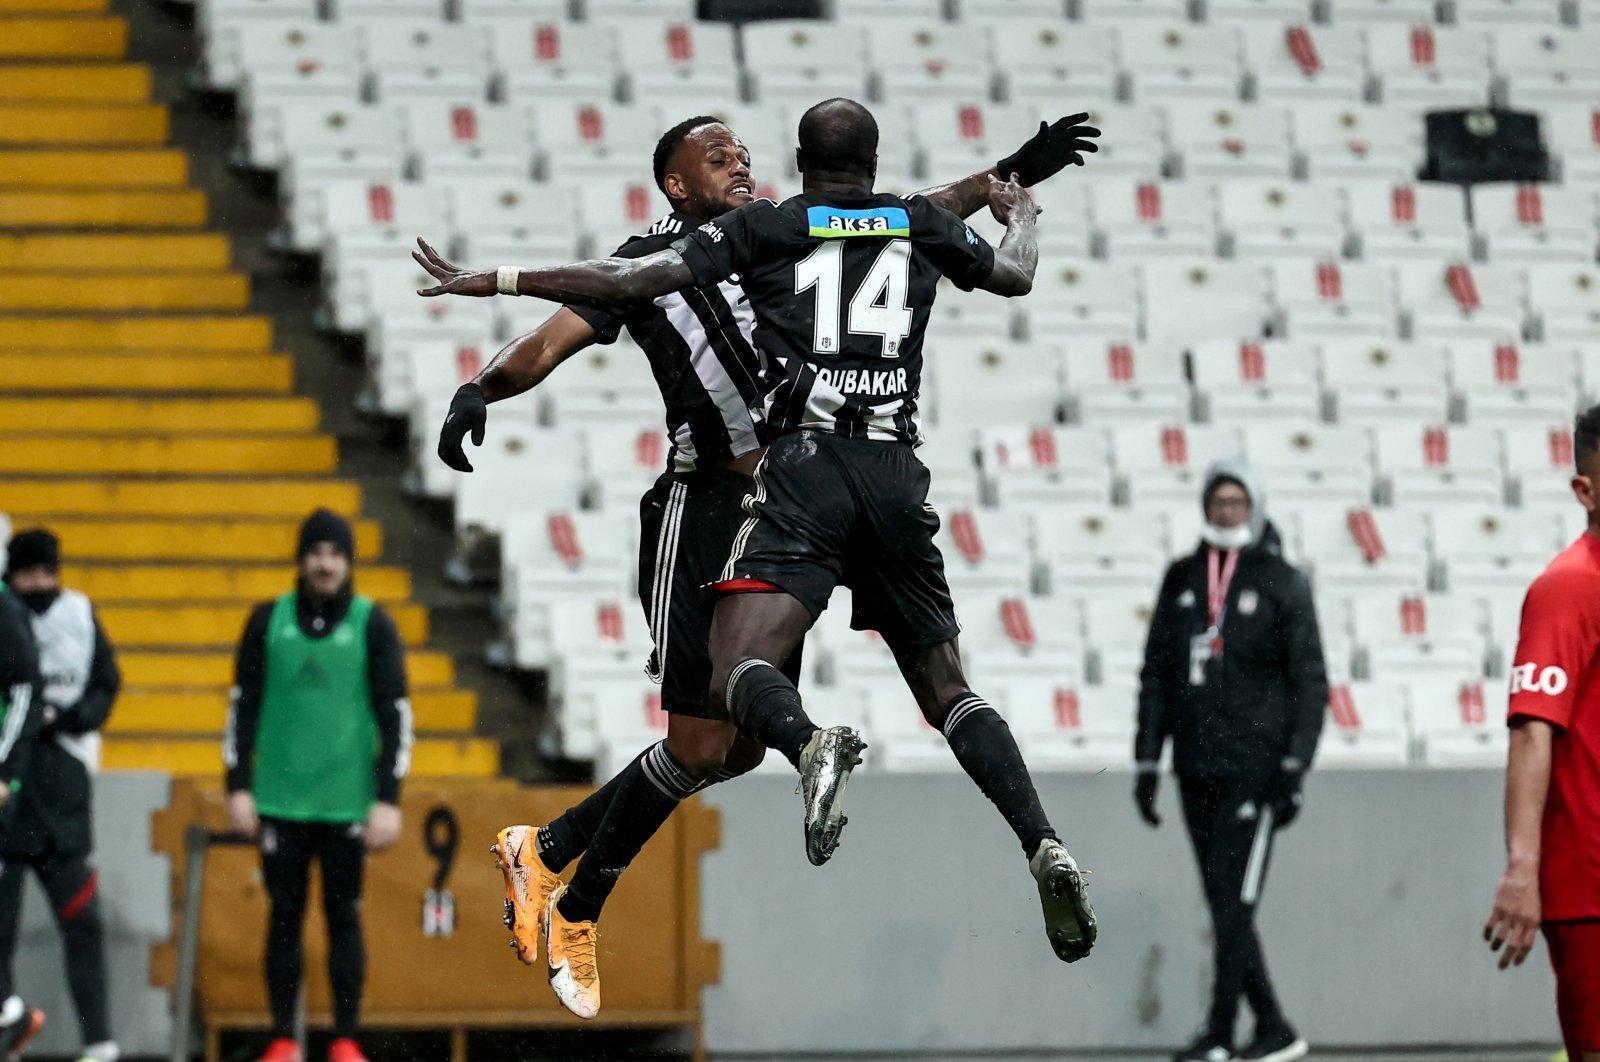 Beşiktaş' Cyle Larin (L) and Vincent Aboubakar celebrate a goal during a Süper Lig match against Gaziantep at Vodafone Park stadium, Istanbul, Turkey, March 11, 2021. (AA Photo)